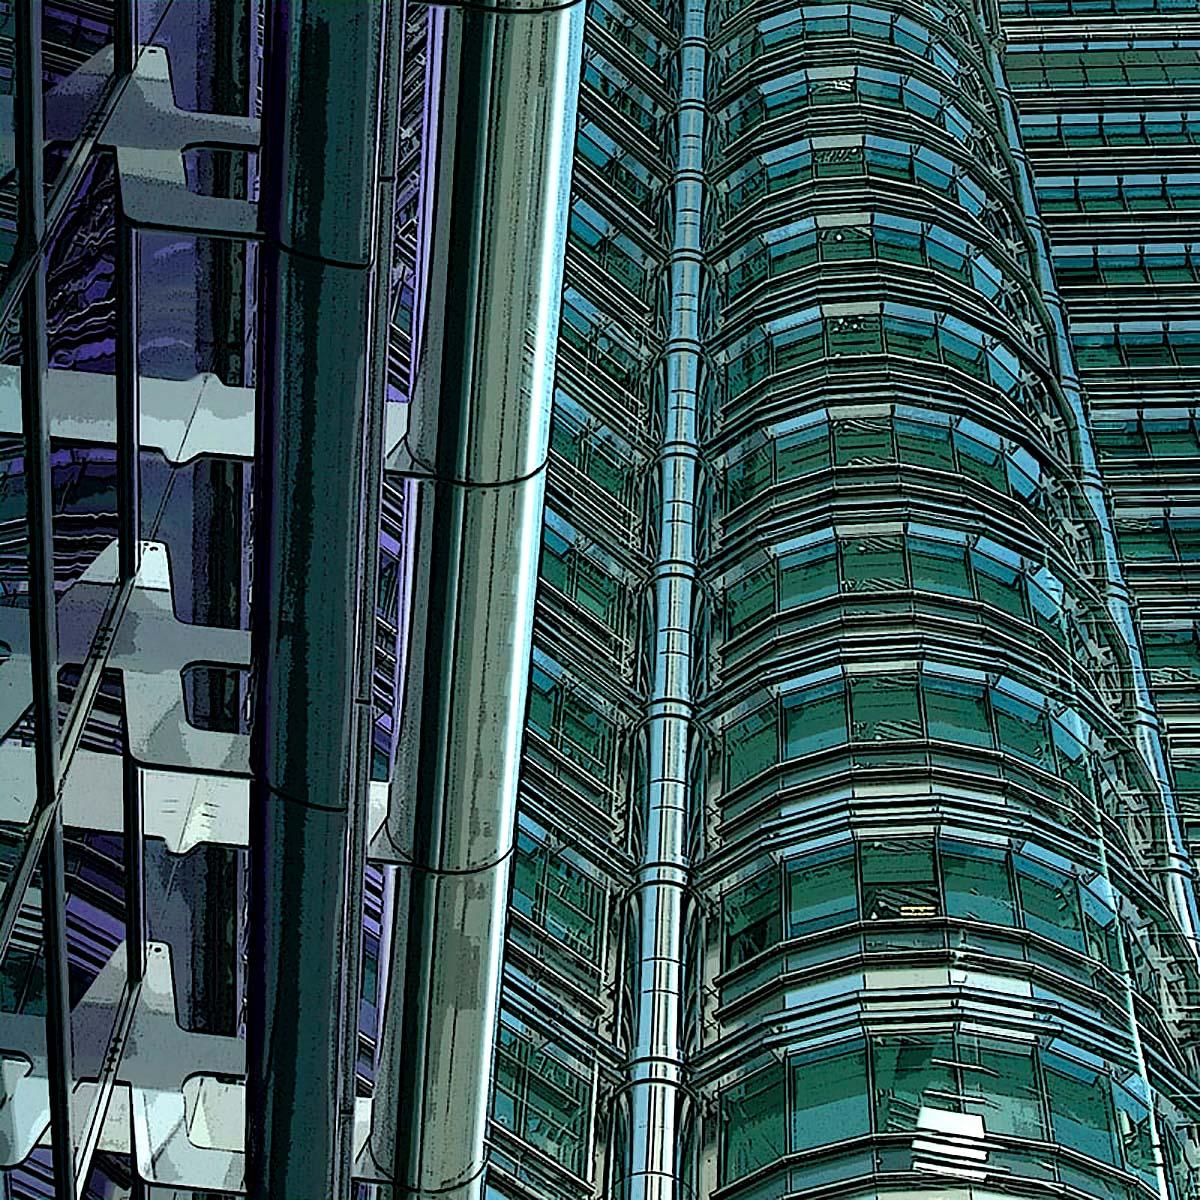 Colin M Bryce, 'Petronas', photographic print